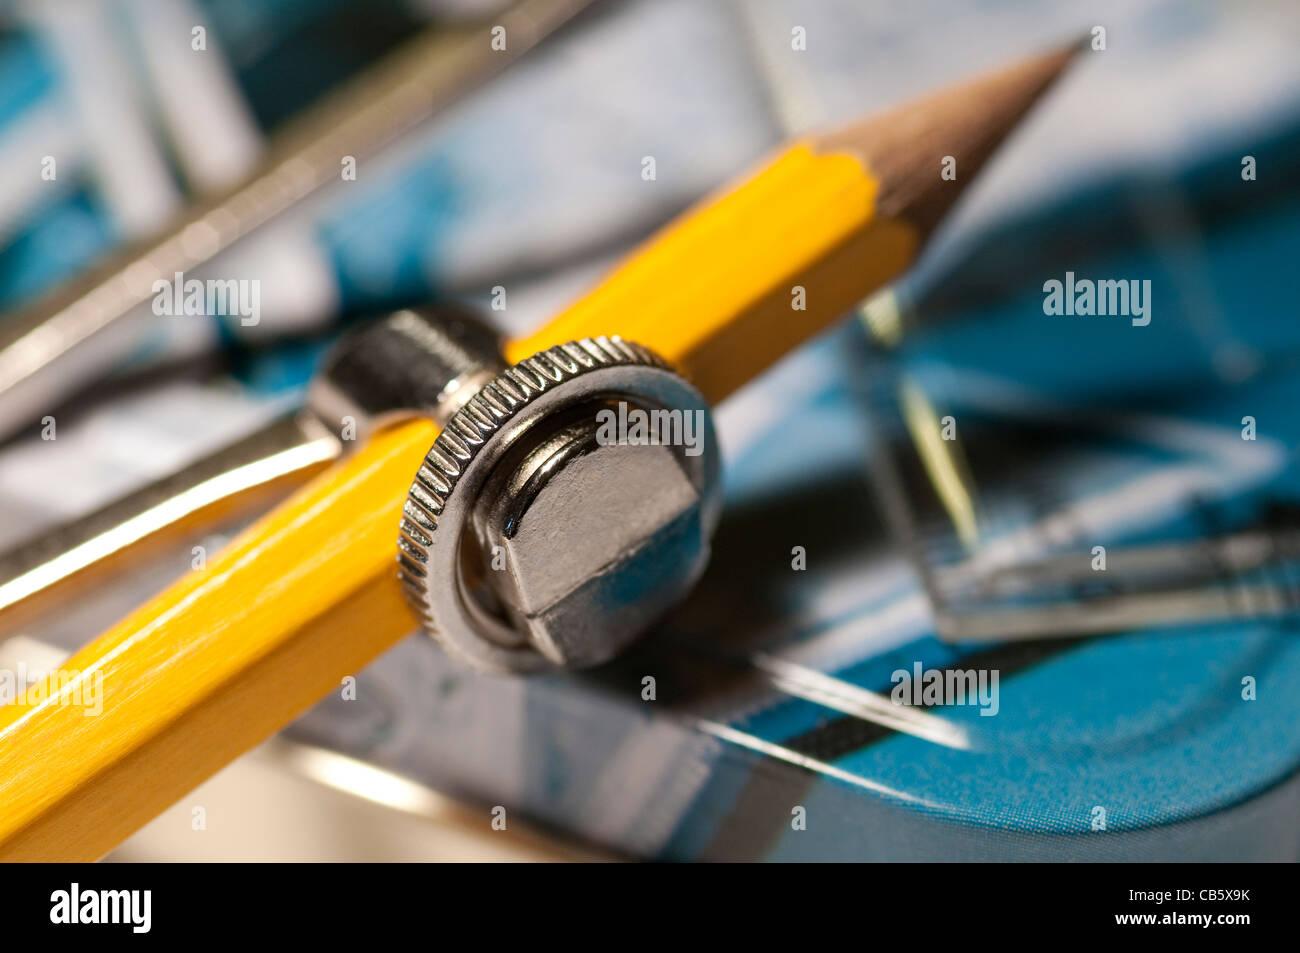 child's geometry compass set - Stock Image